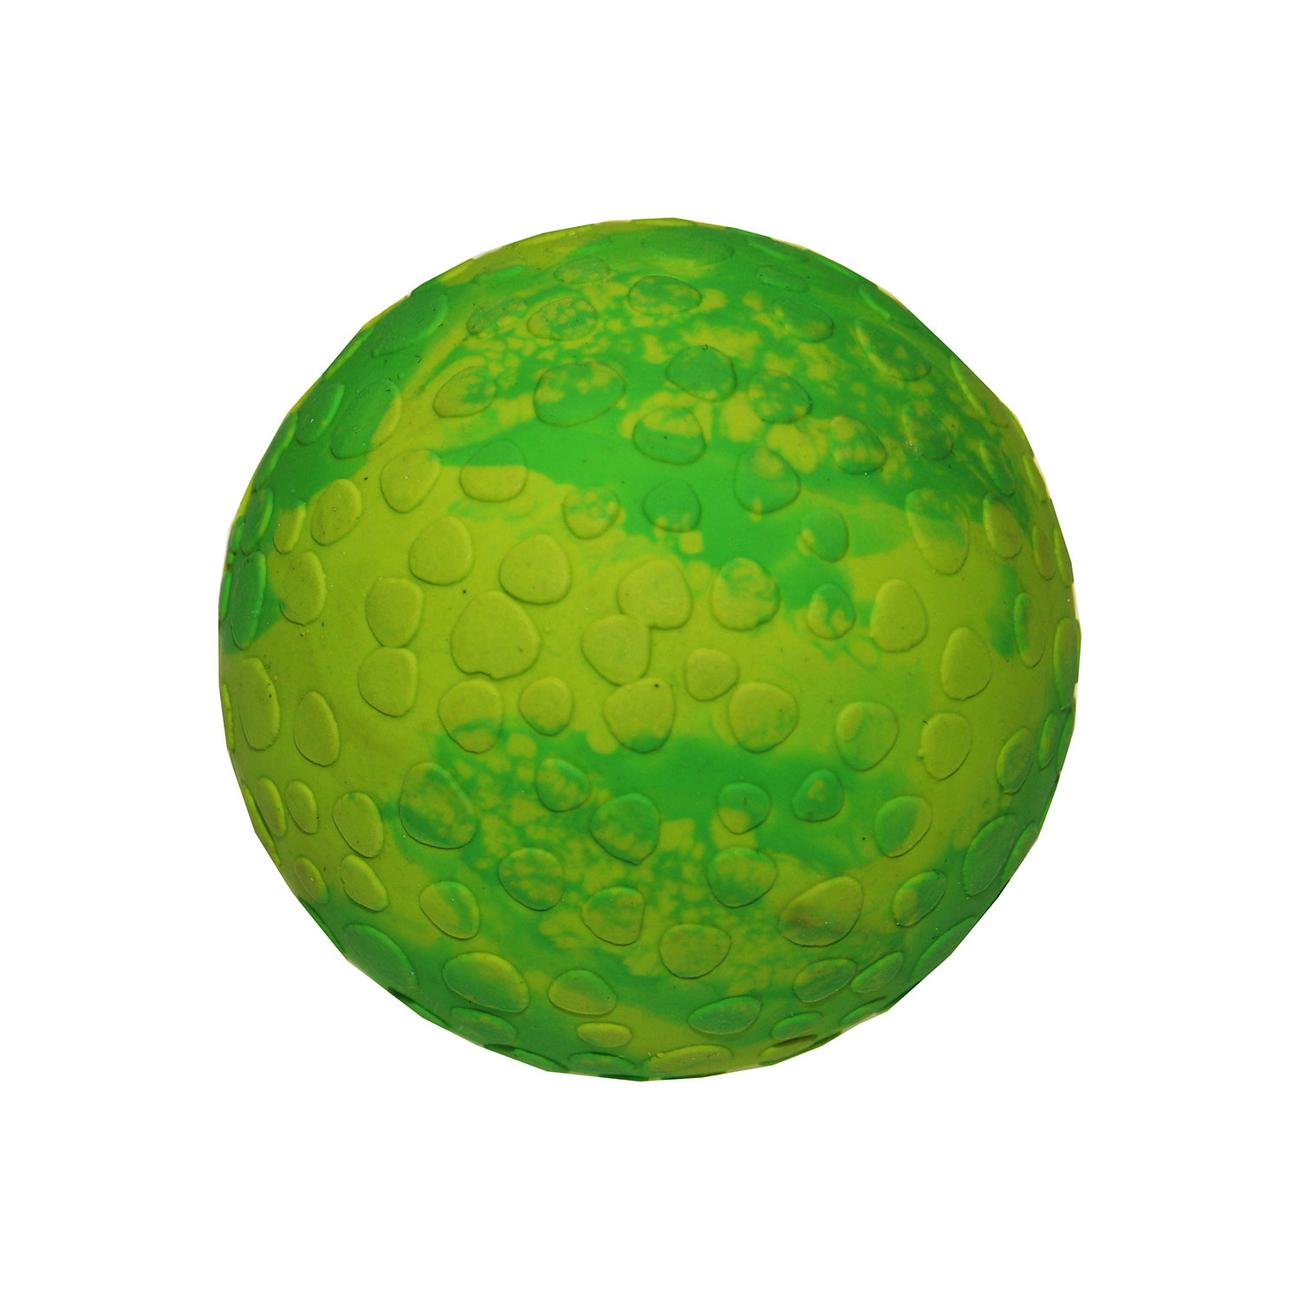 Wolters Aqua-Fun Wasserball Hundespielzeug, Bild 4